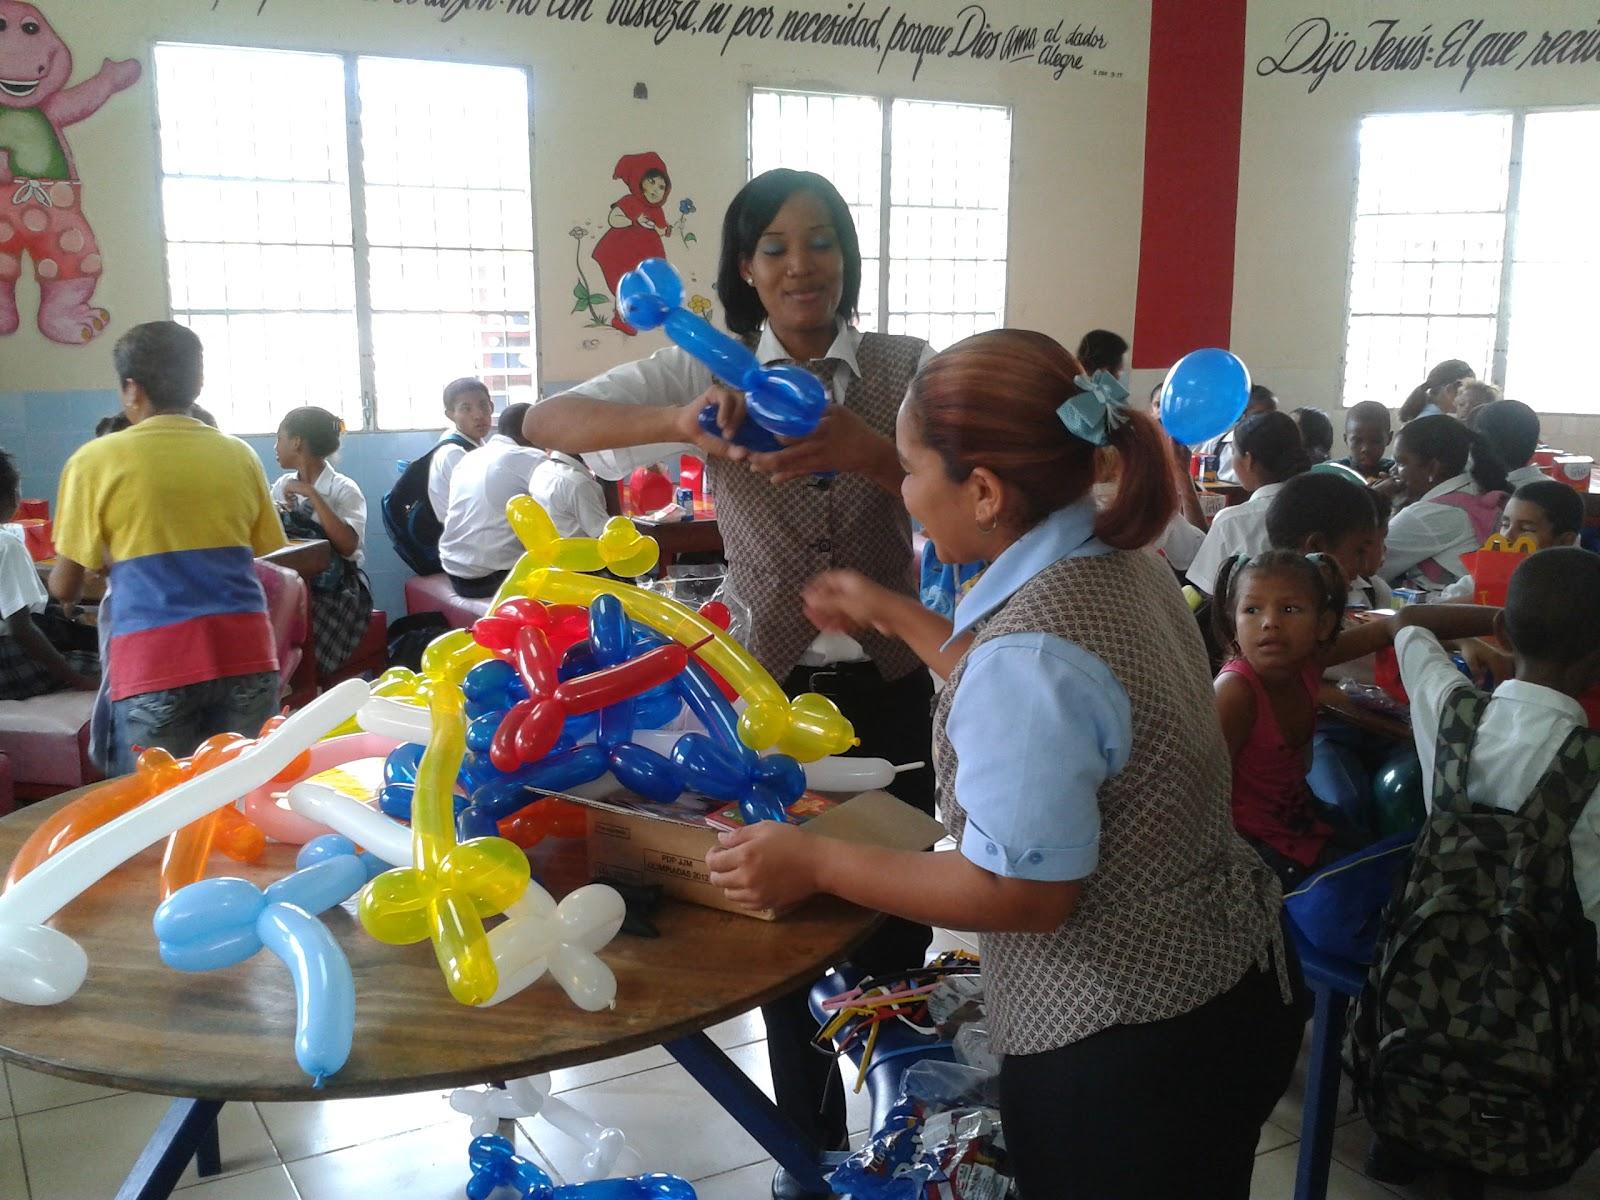 Dutary s creando sonrisas a ni os de comedor infantil en for Comedor infantil